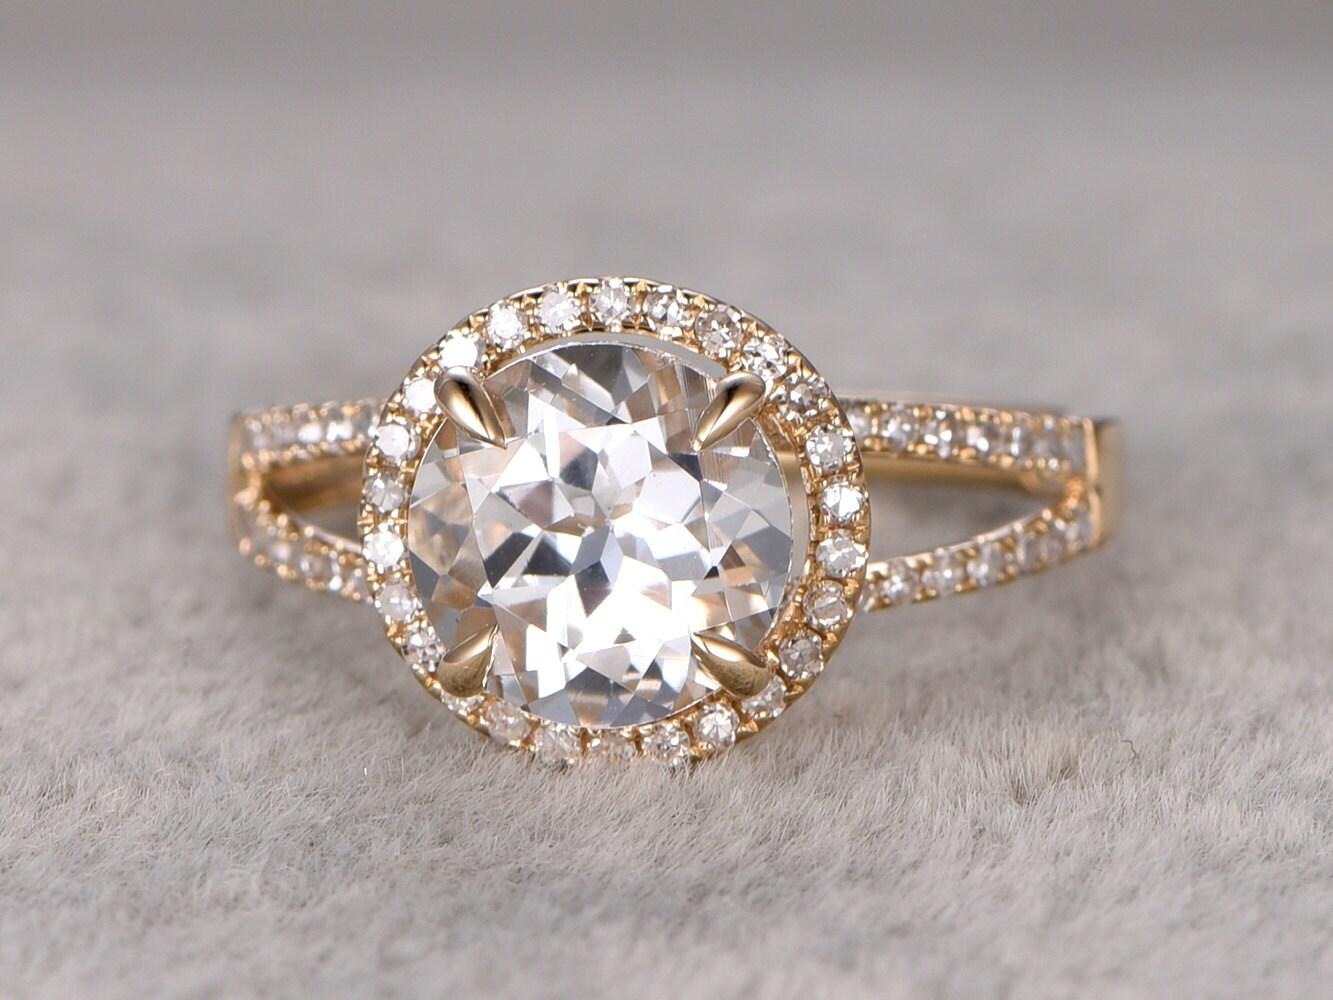 2 3ct white topaz engagement ringdiamond wedding ring14k